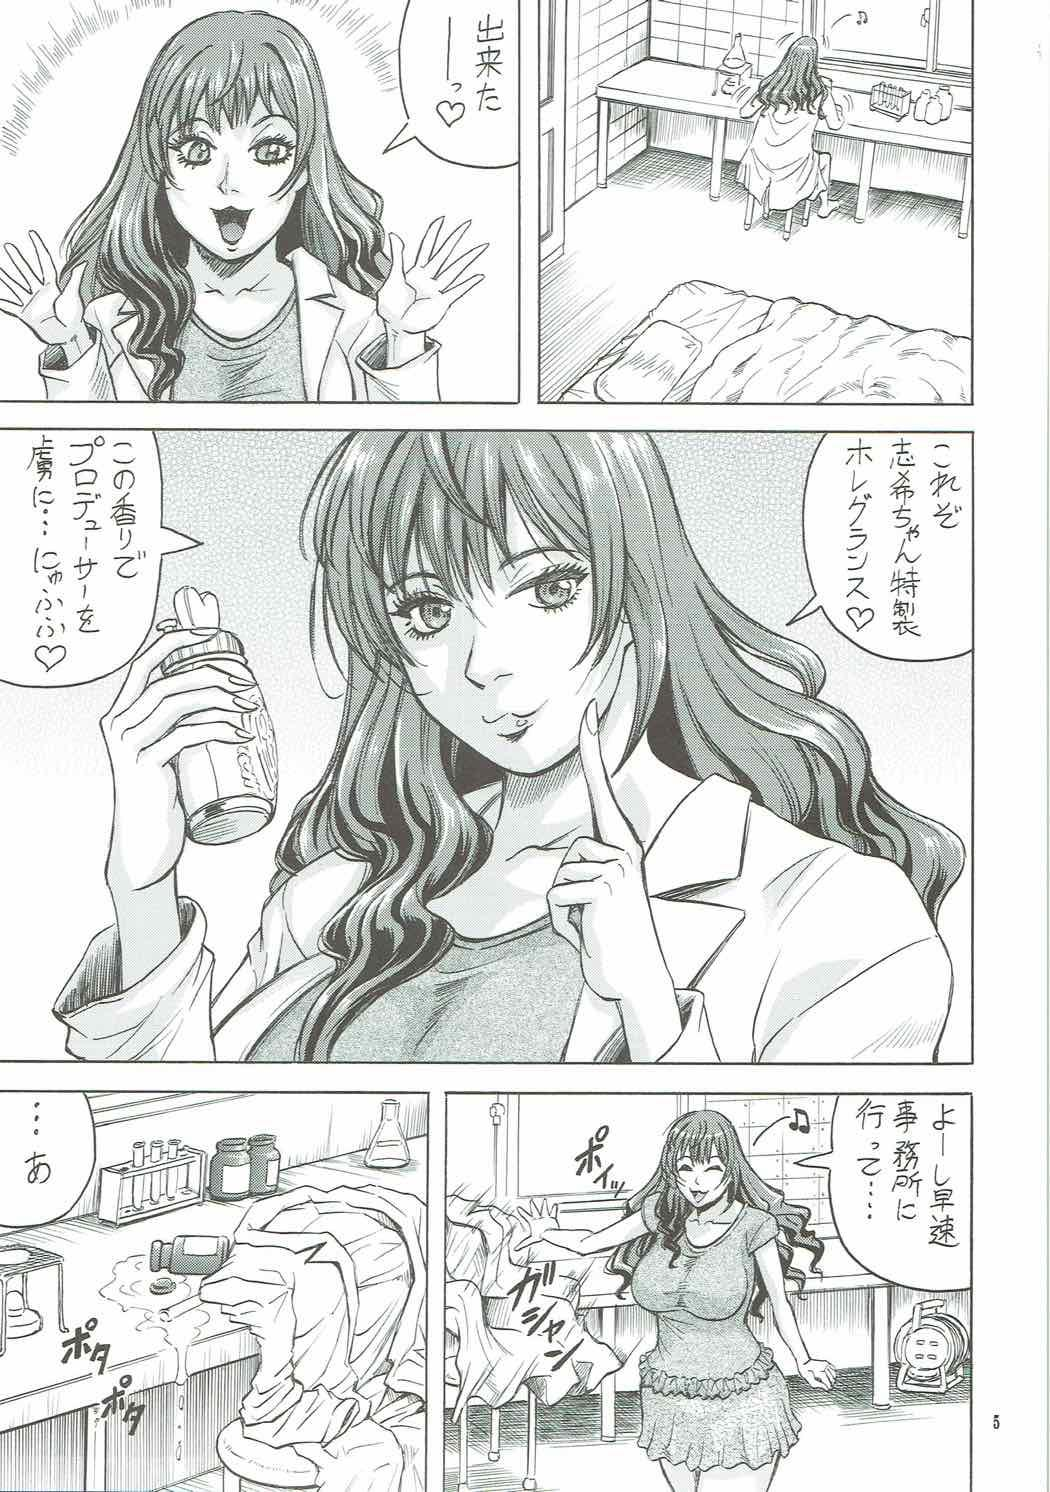 Perfume Tripper 3